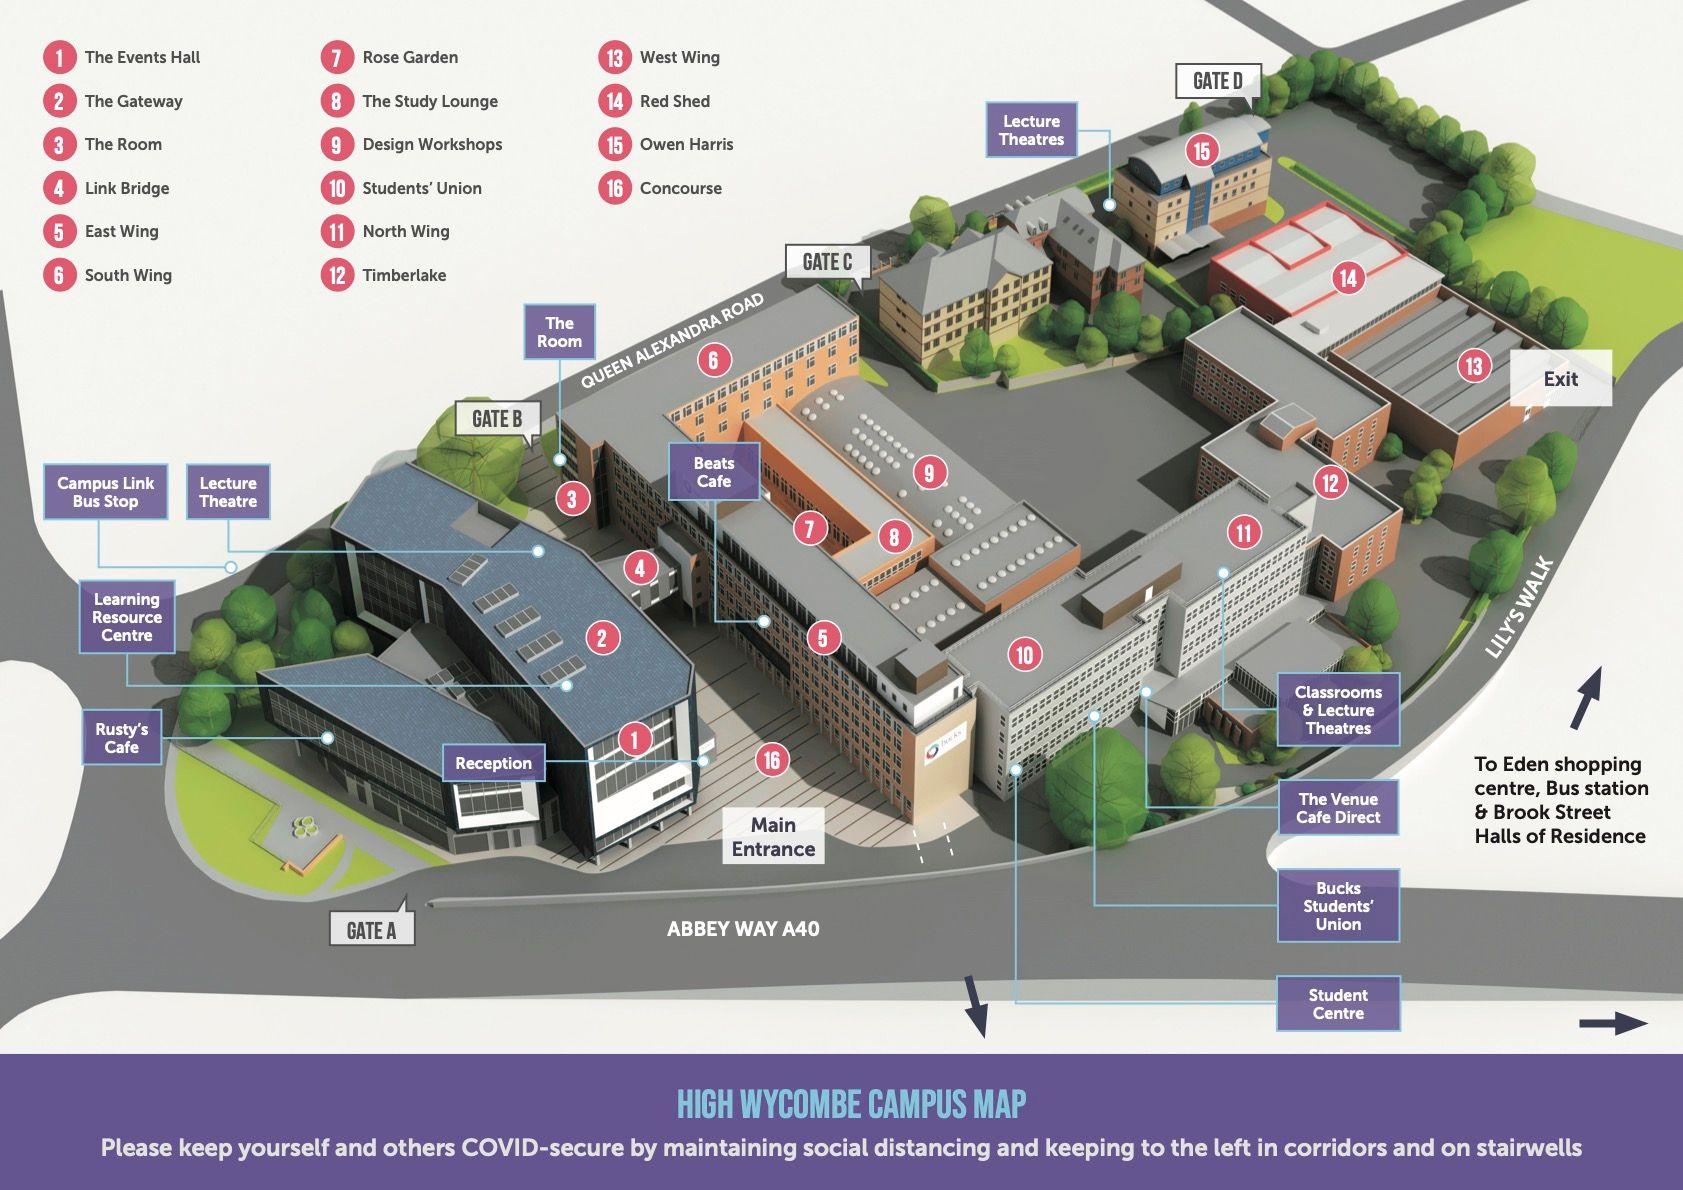 buckinghamshire new university high wycombe